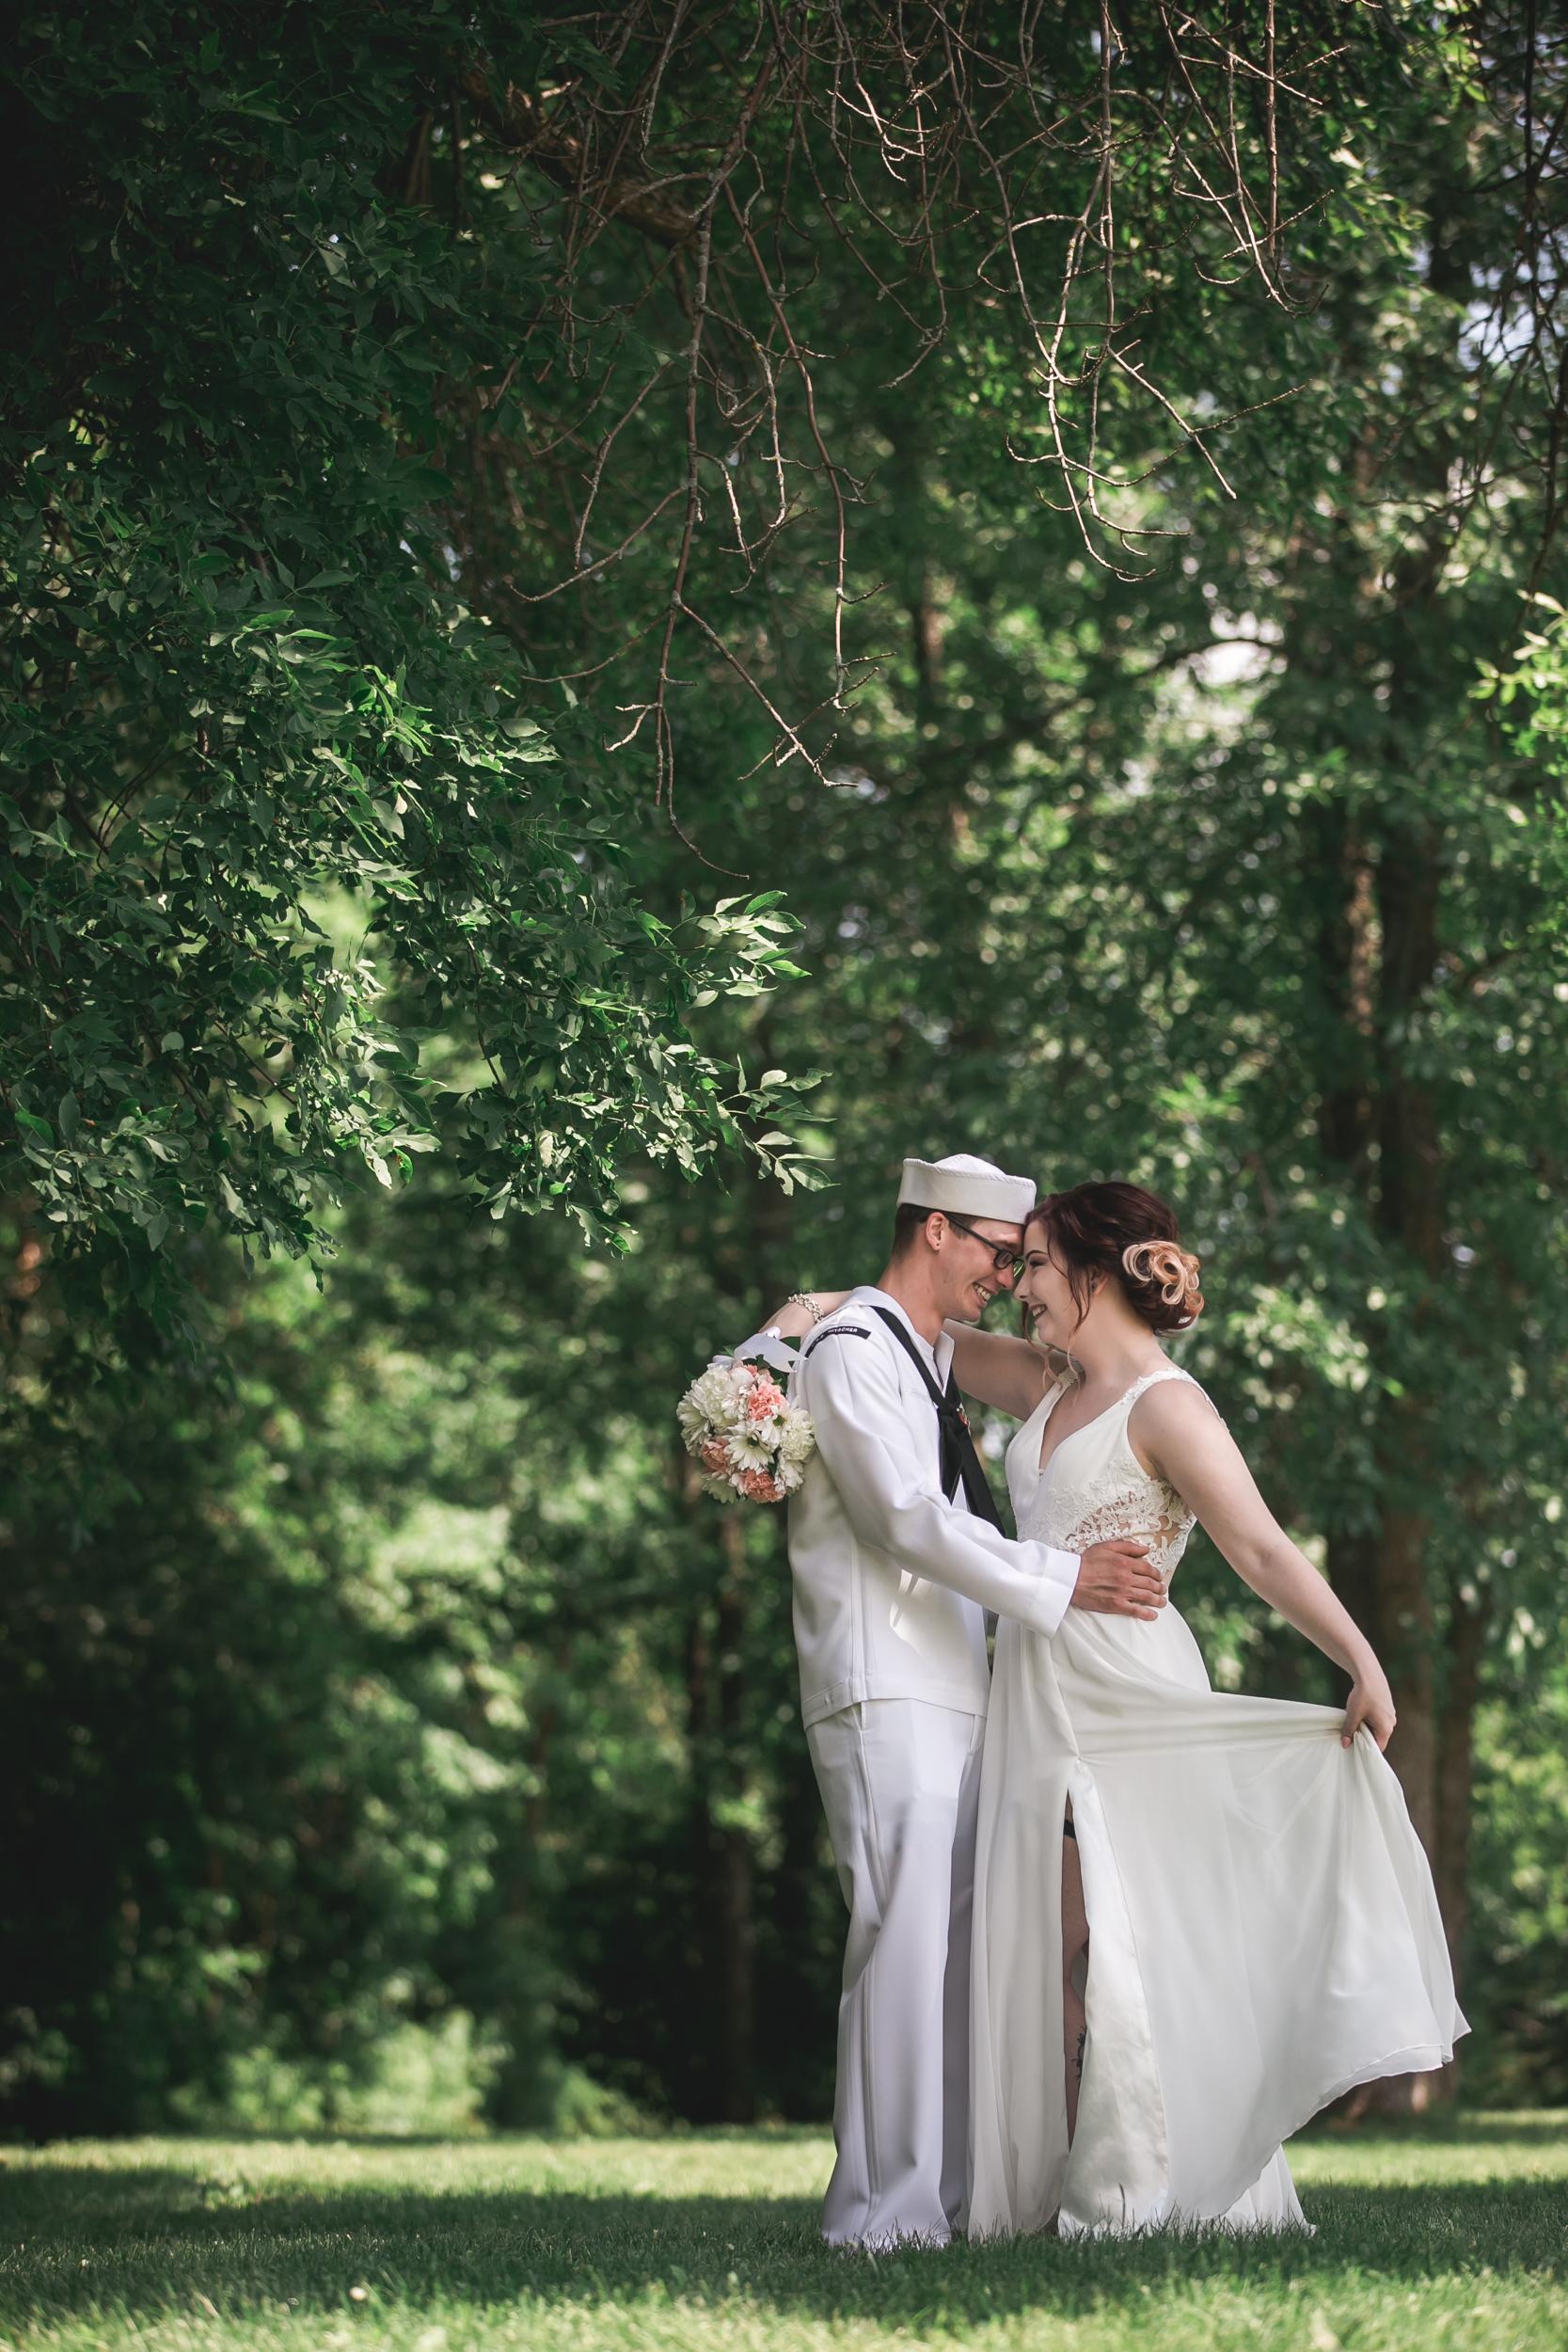 intimate elopement wedding, duluth mn, duluth mn elopement wedding, -www.rachelsmak.com17.jpg